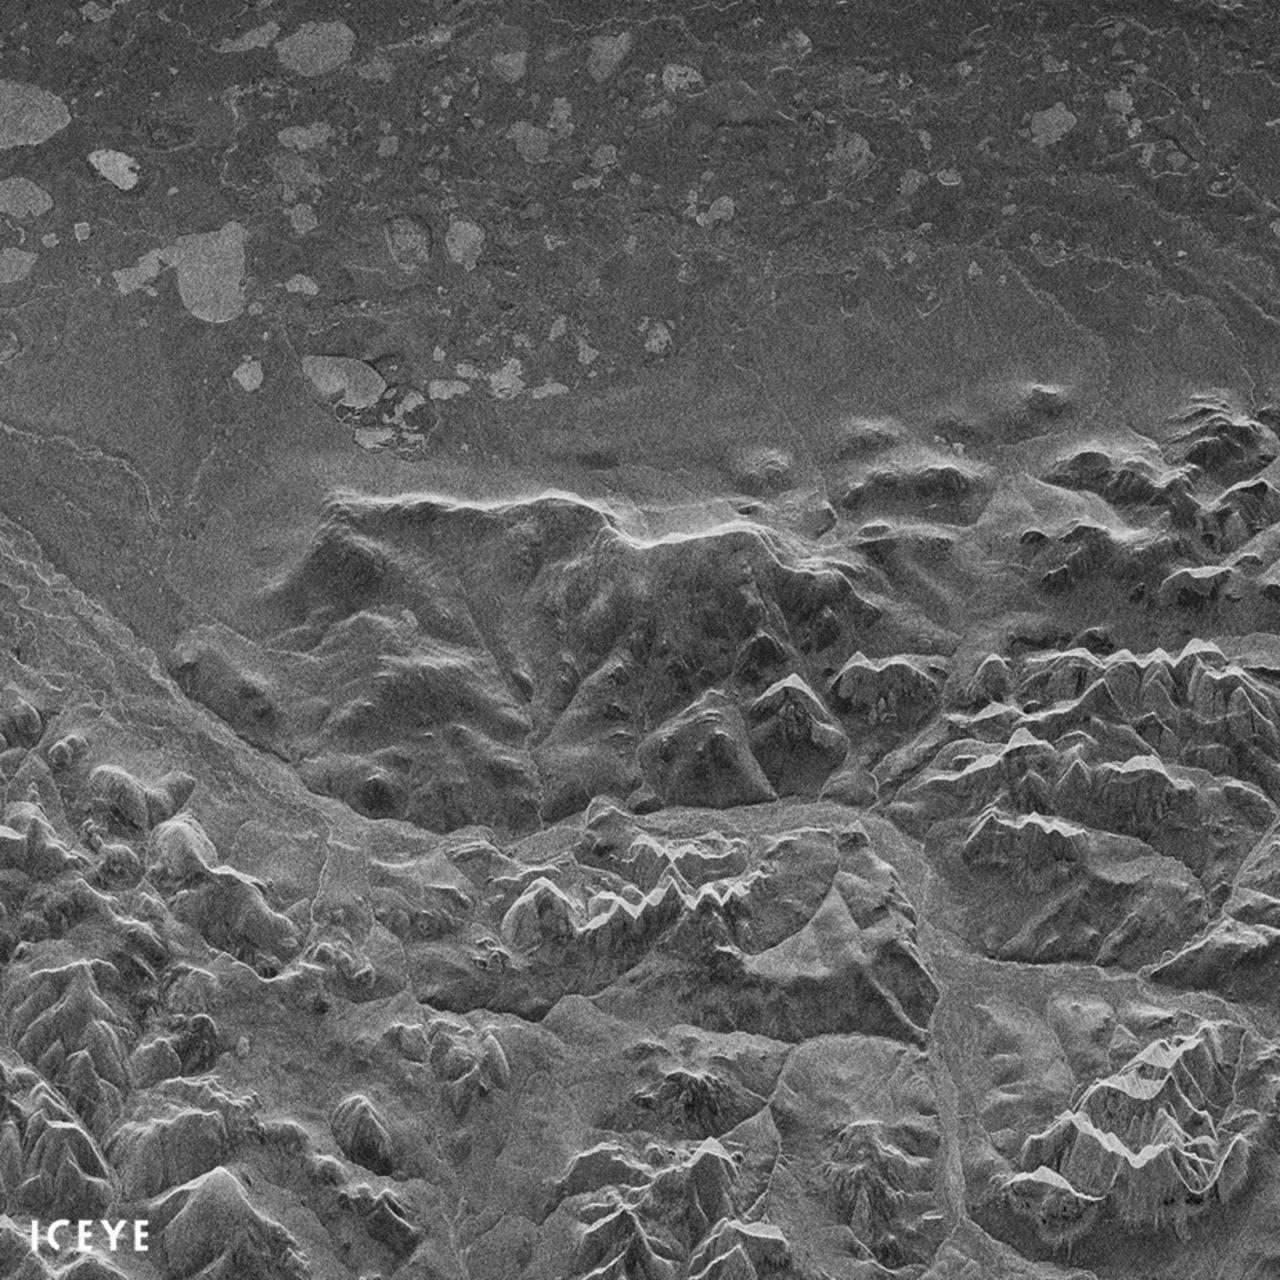 First Iceye X1 radar Image from space of Noatak National Preserve, Alaska. Photo: Iceye.